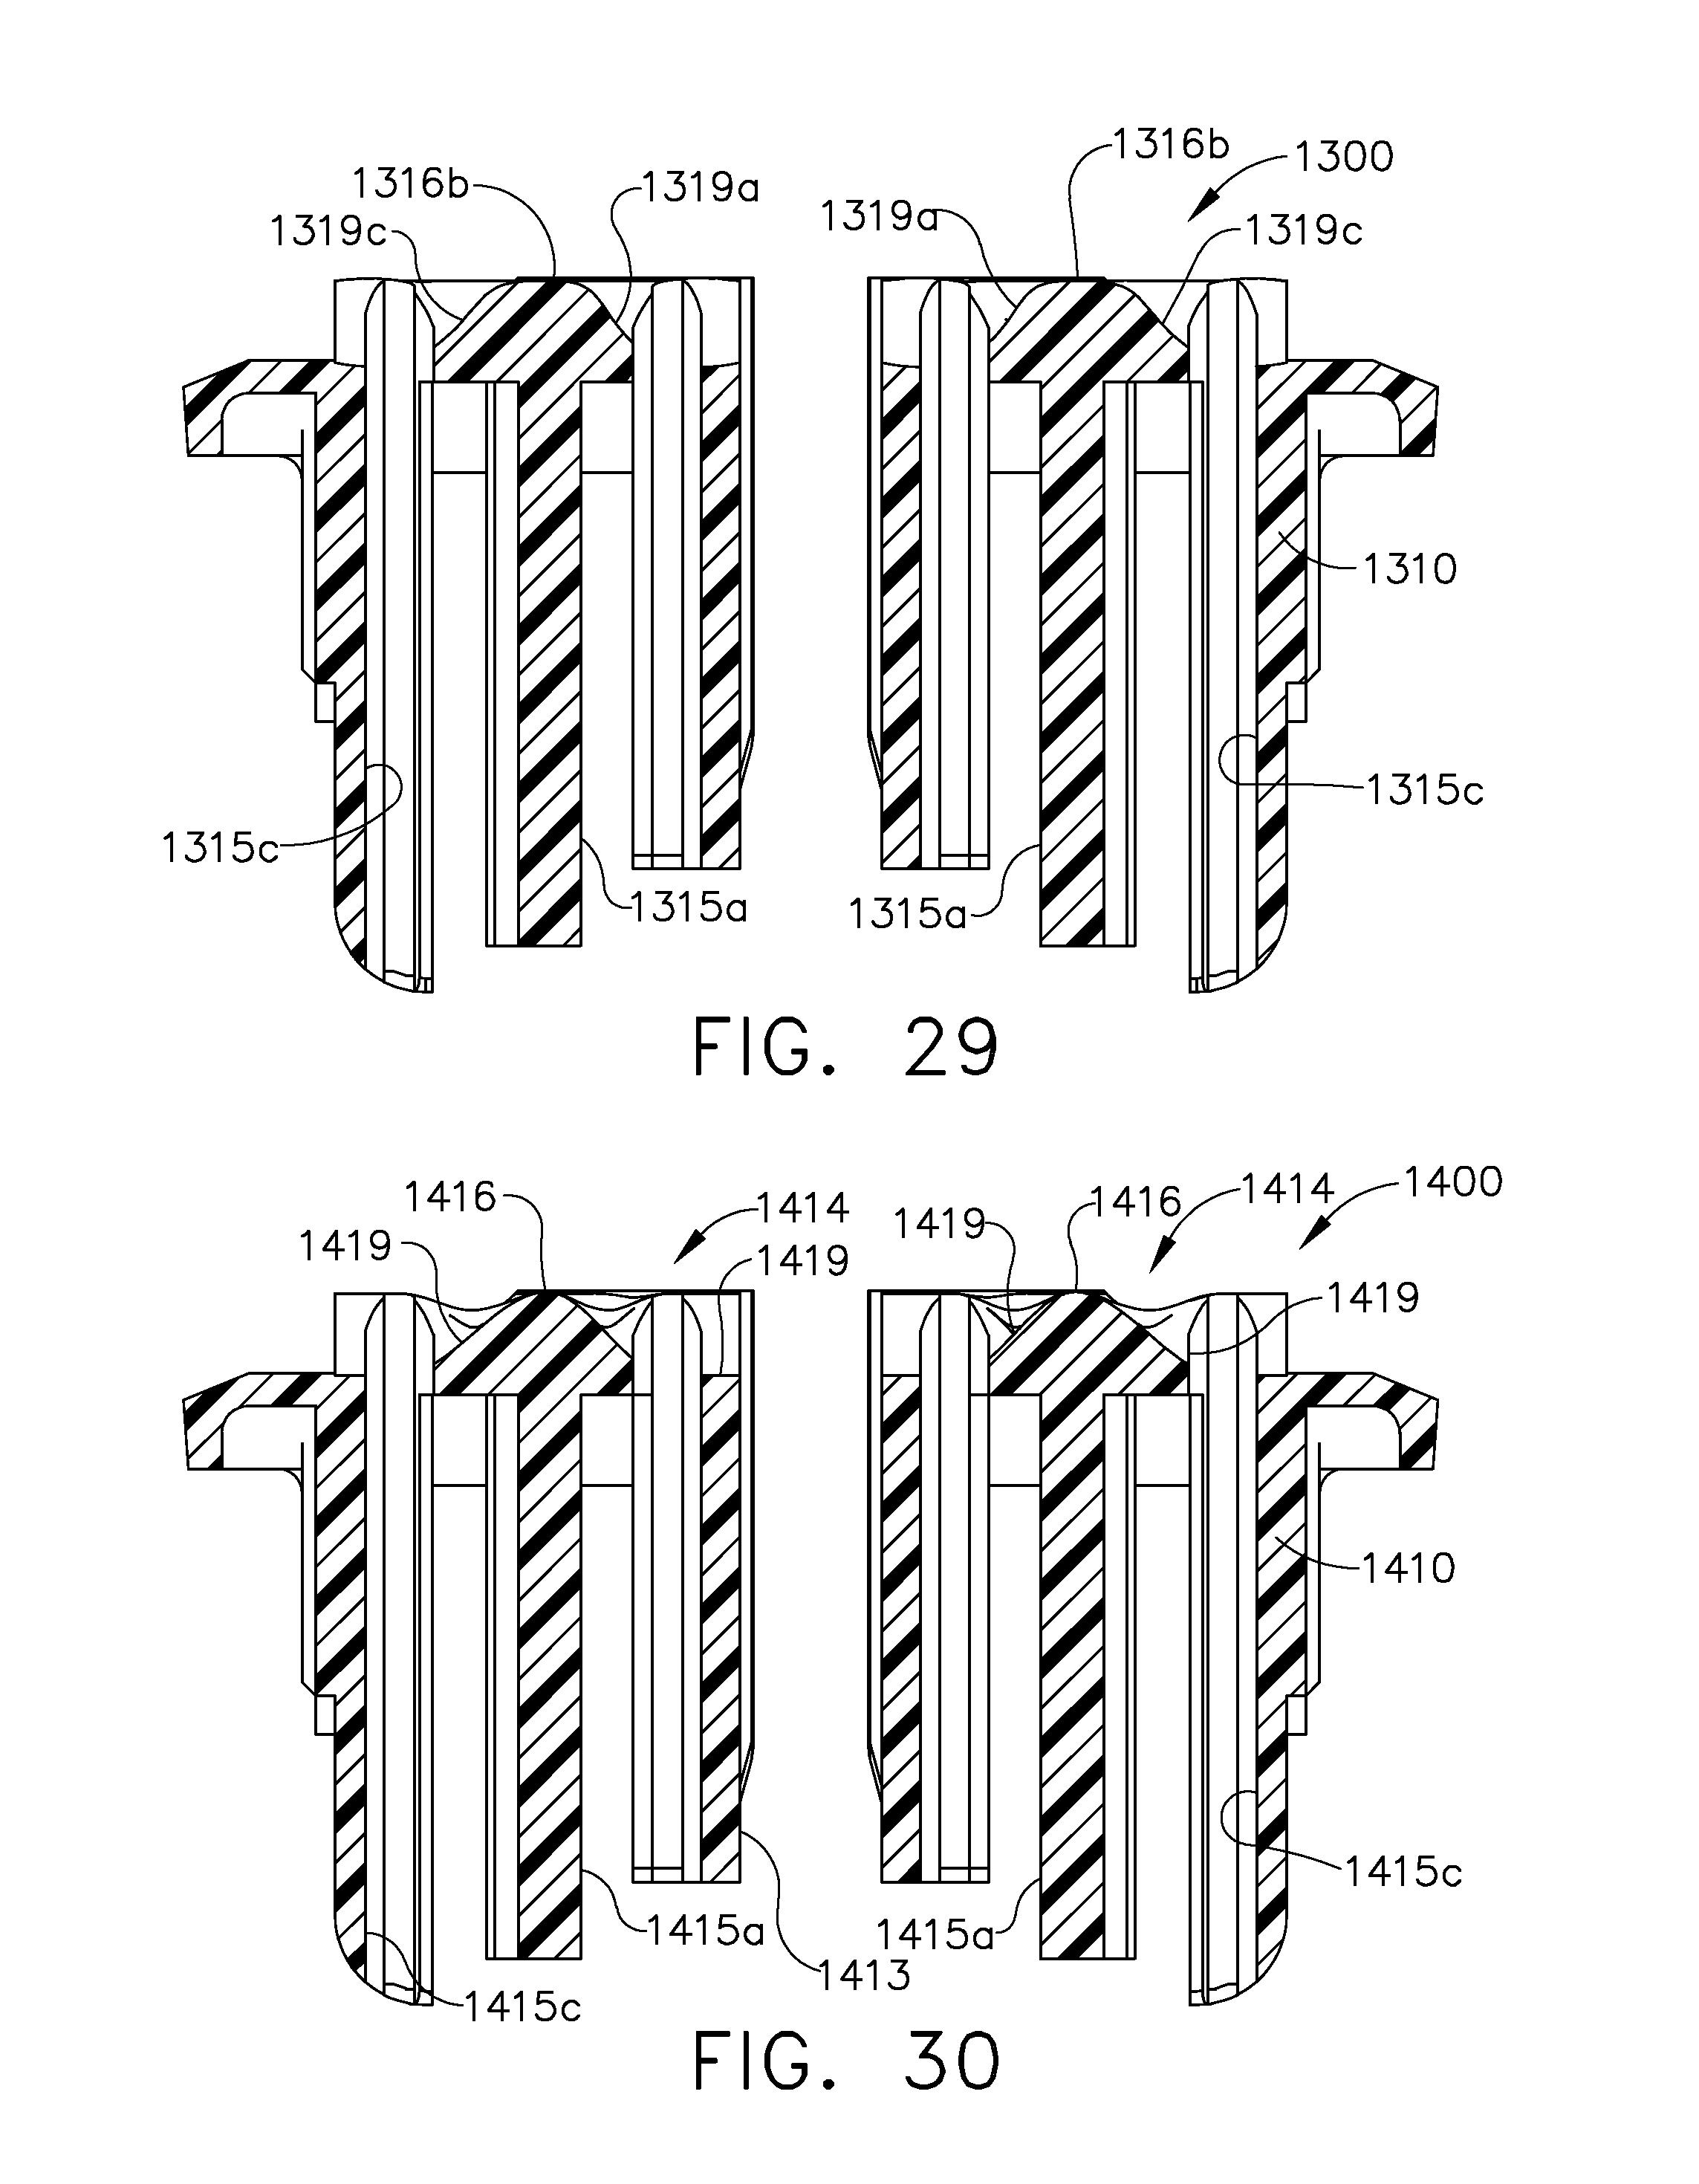 US A1 Staple cartridge prising an adjunct material